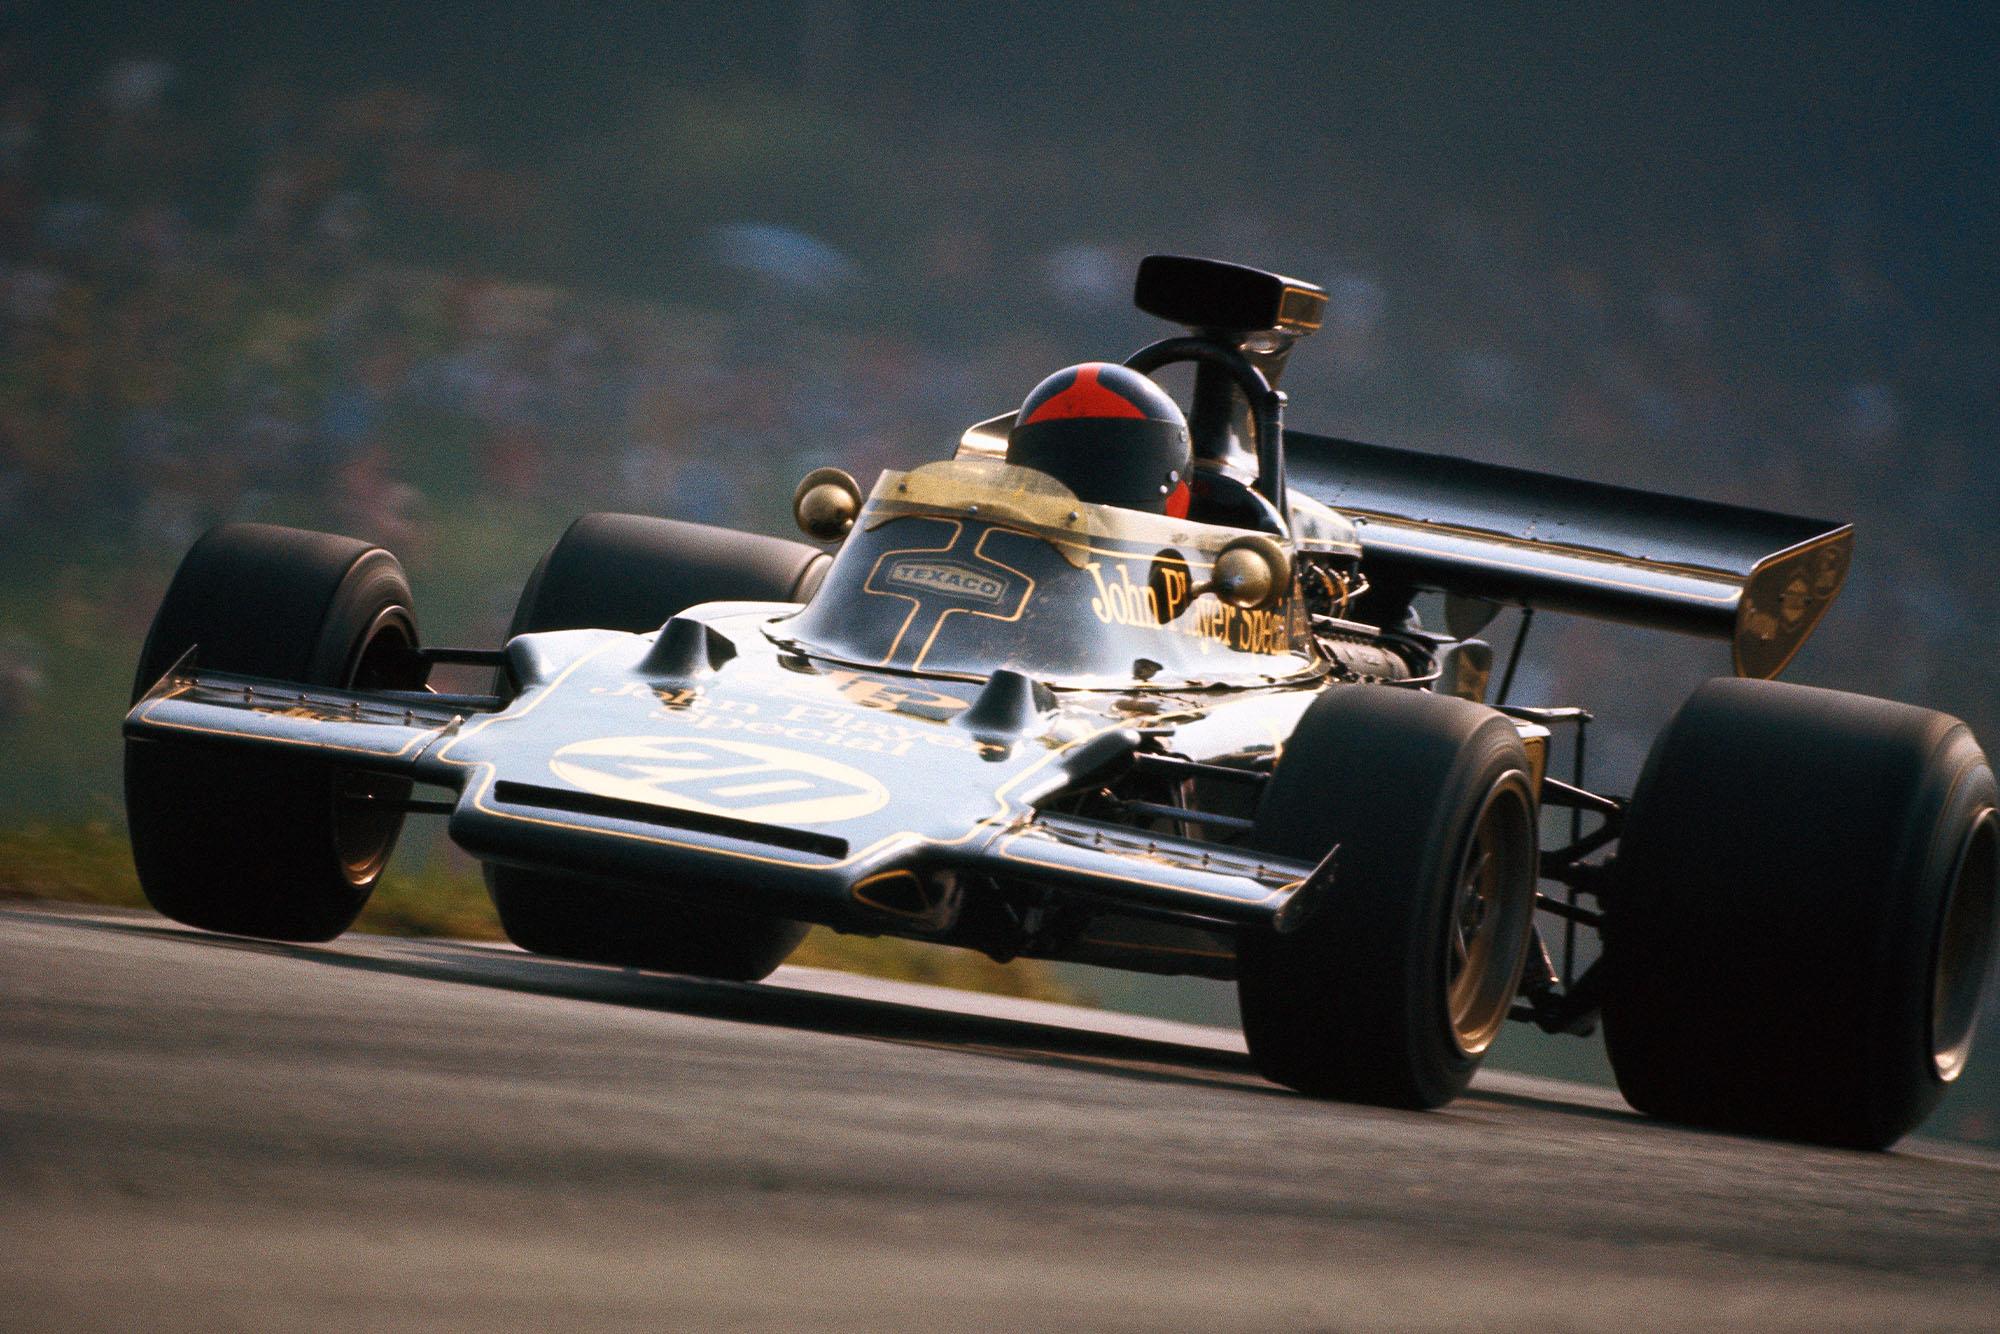 Emerson Fittipaldi driving for Lotus at the 1972 Austrian Grand Prix.